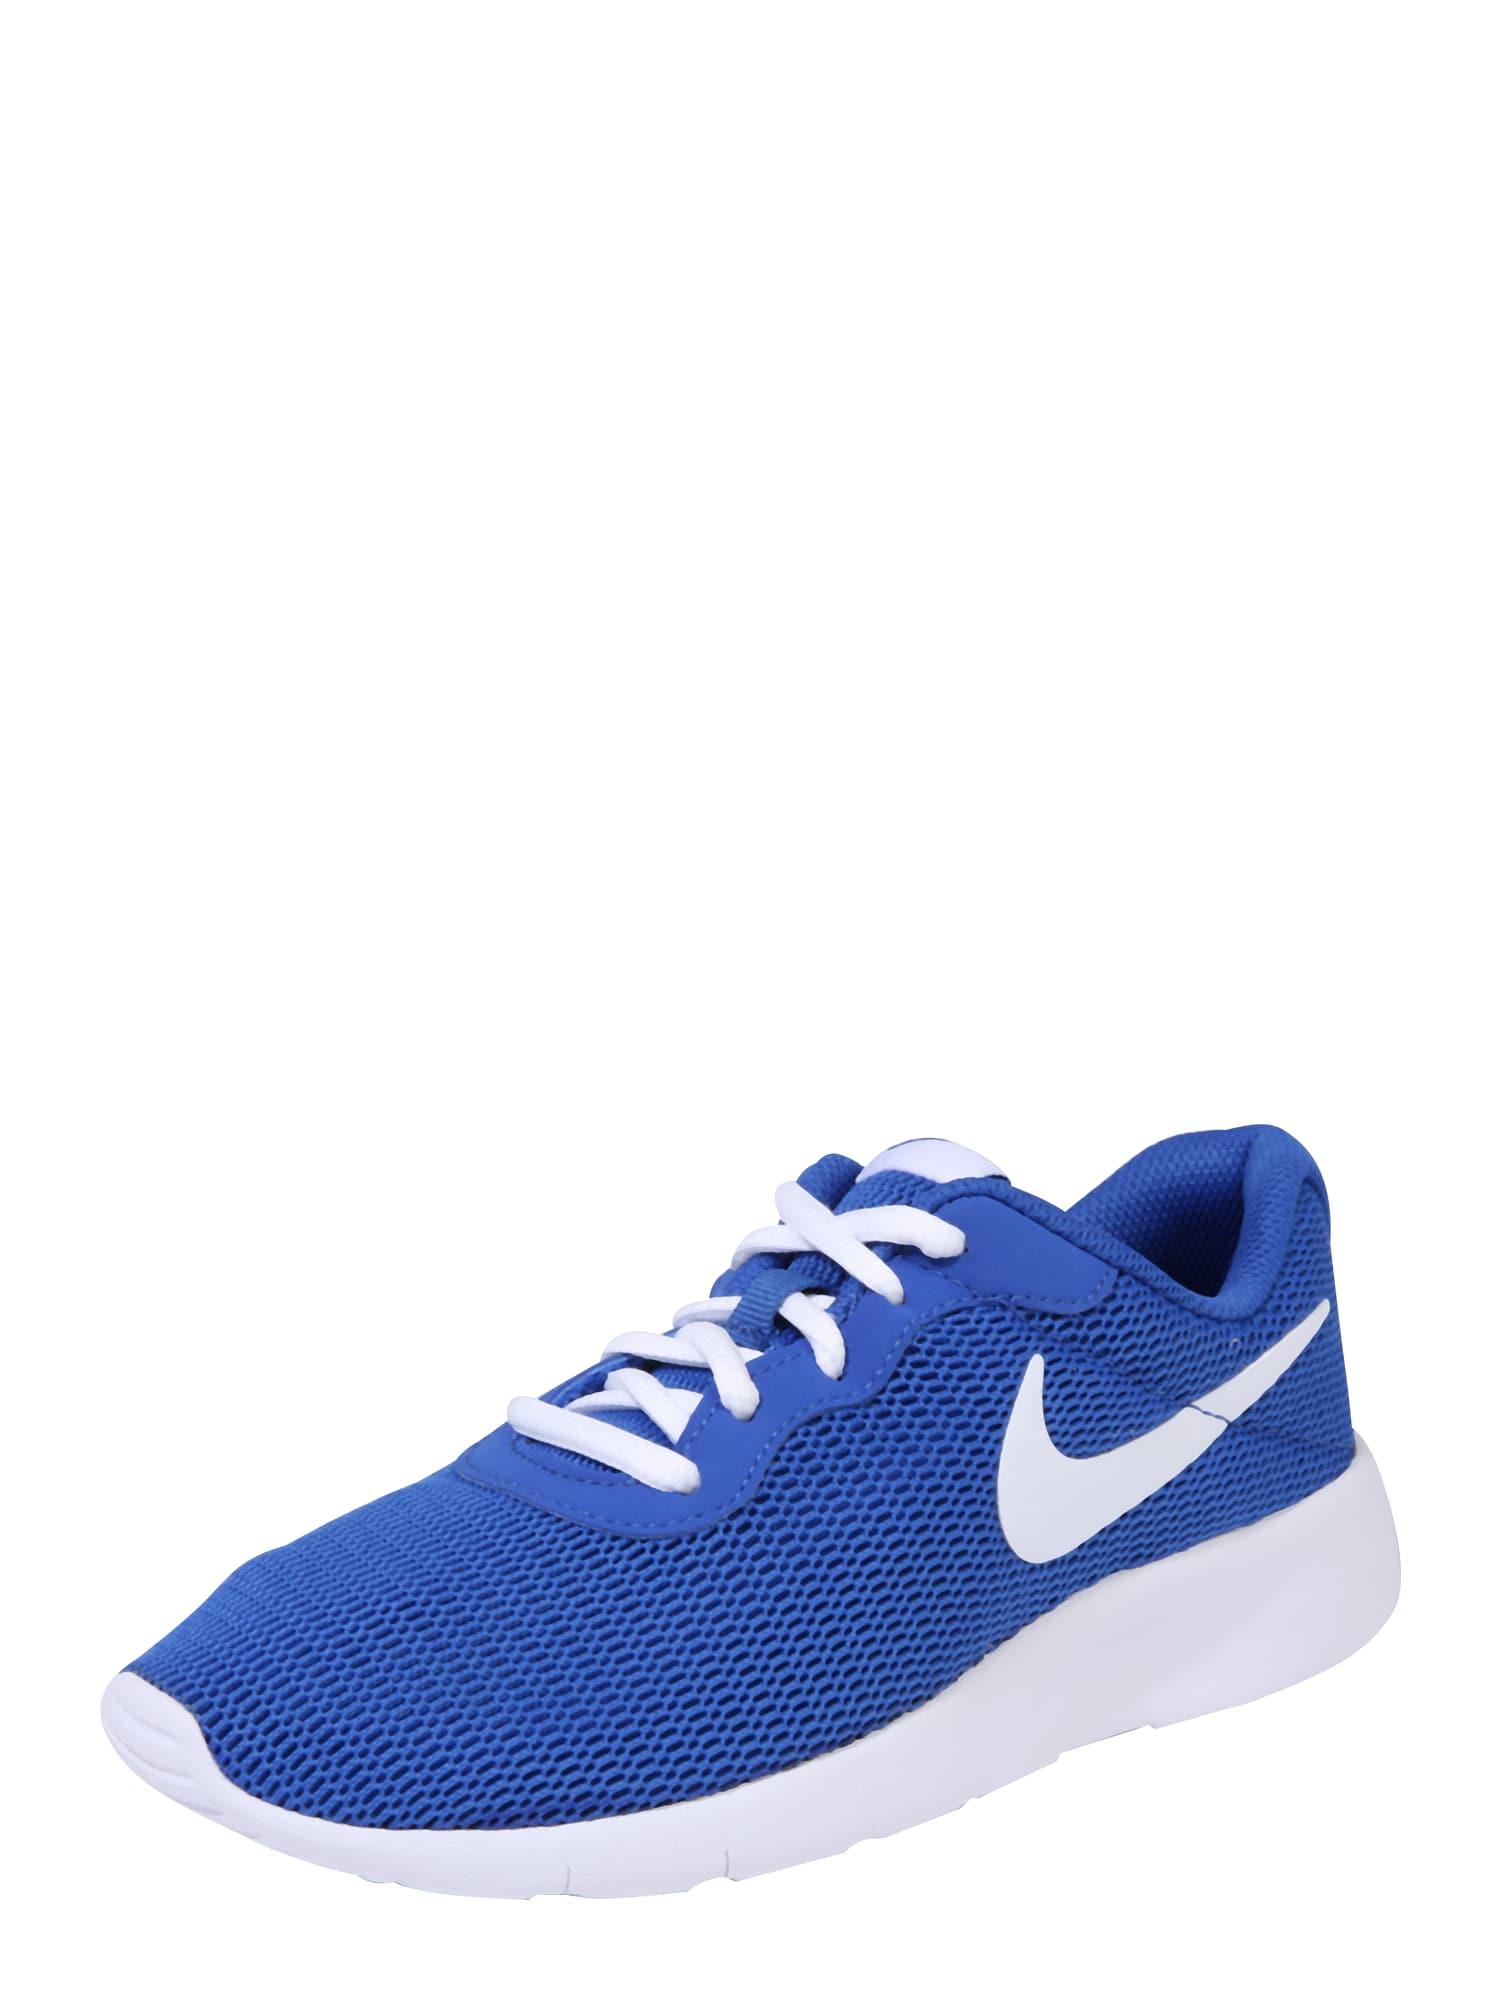 Jungen Nike Tanjun Schuhe DunkelGrauRotWeiß | Nike Schuhe